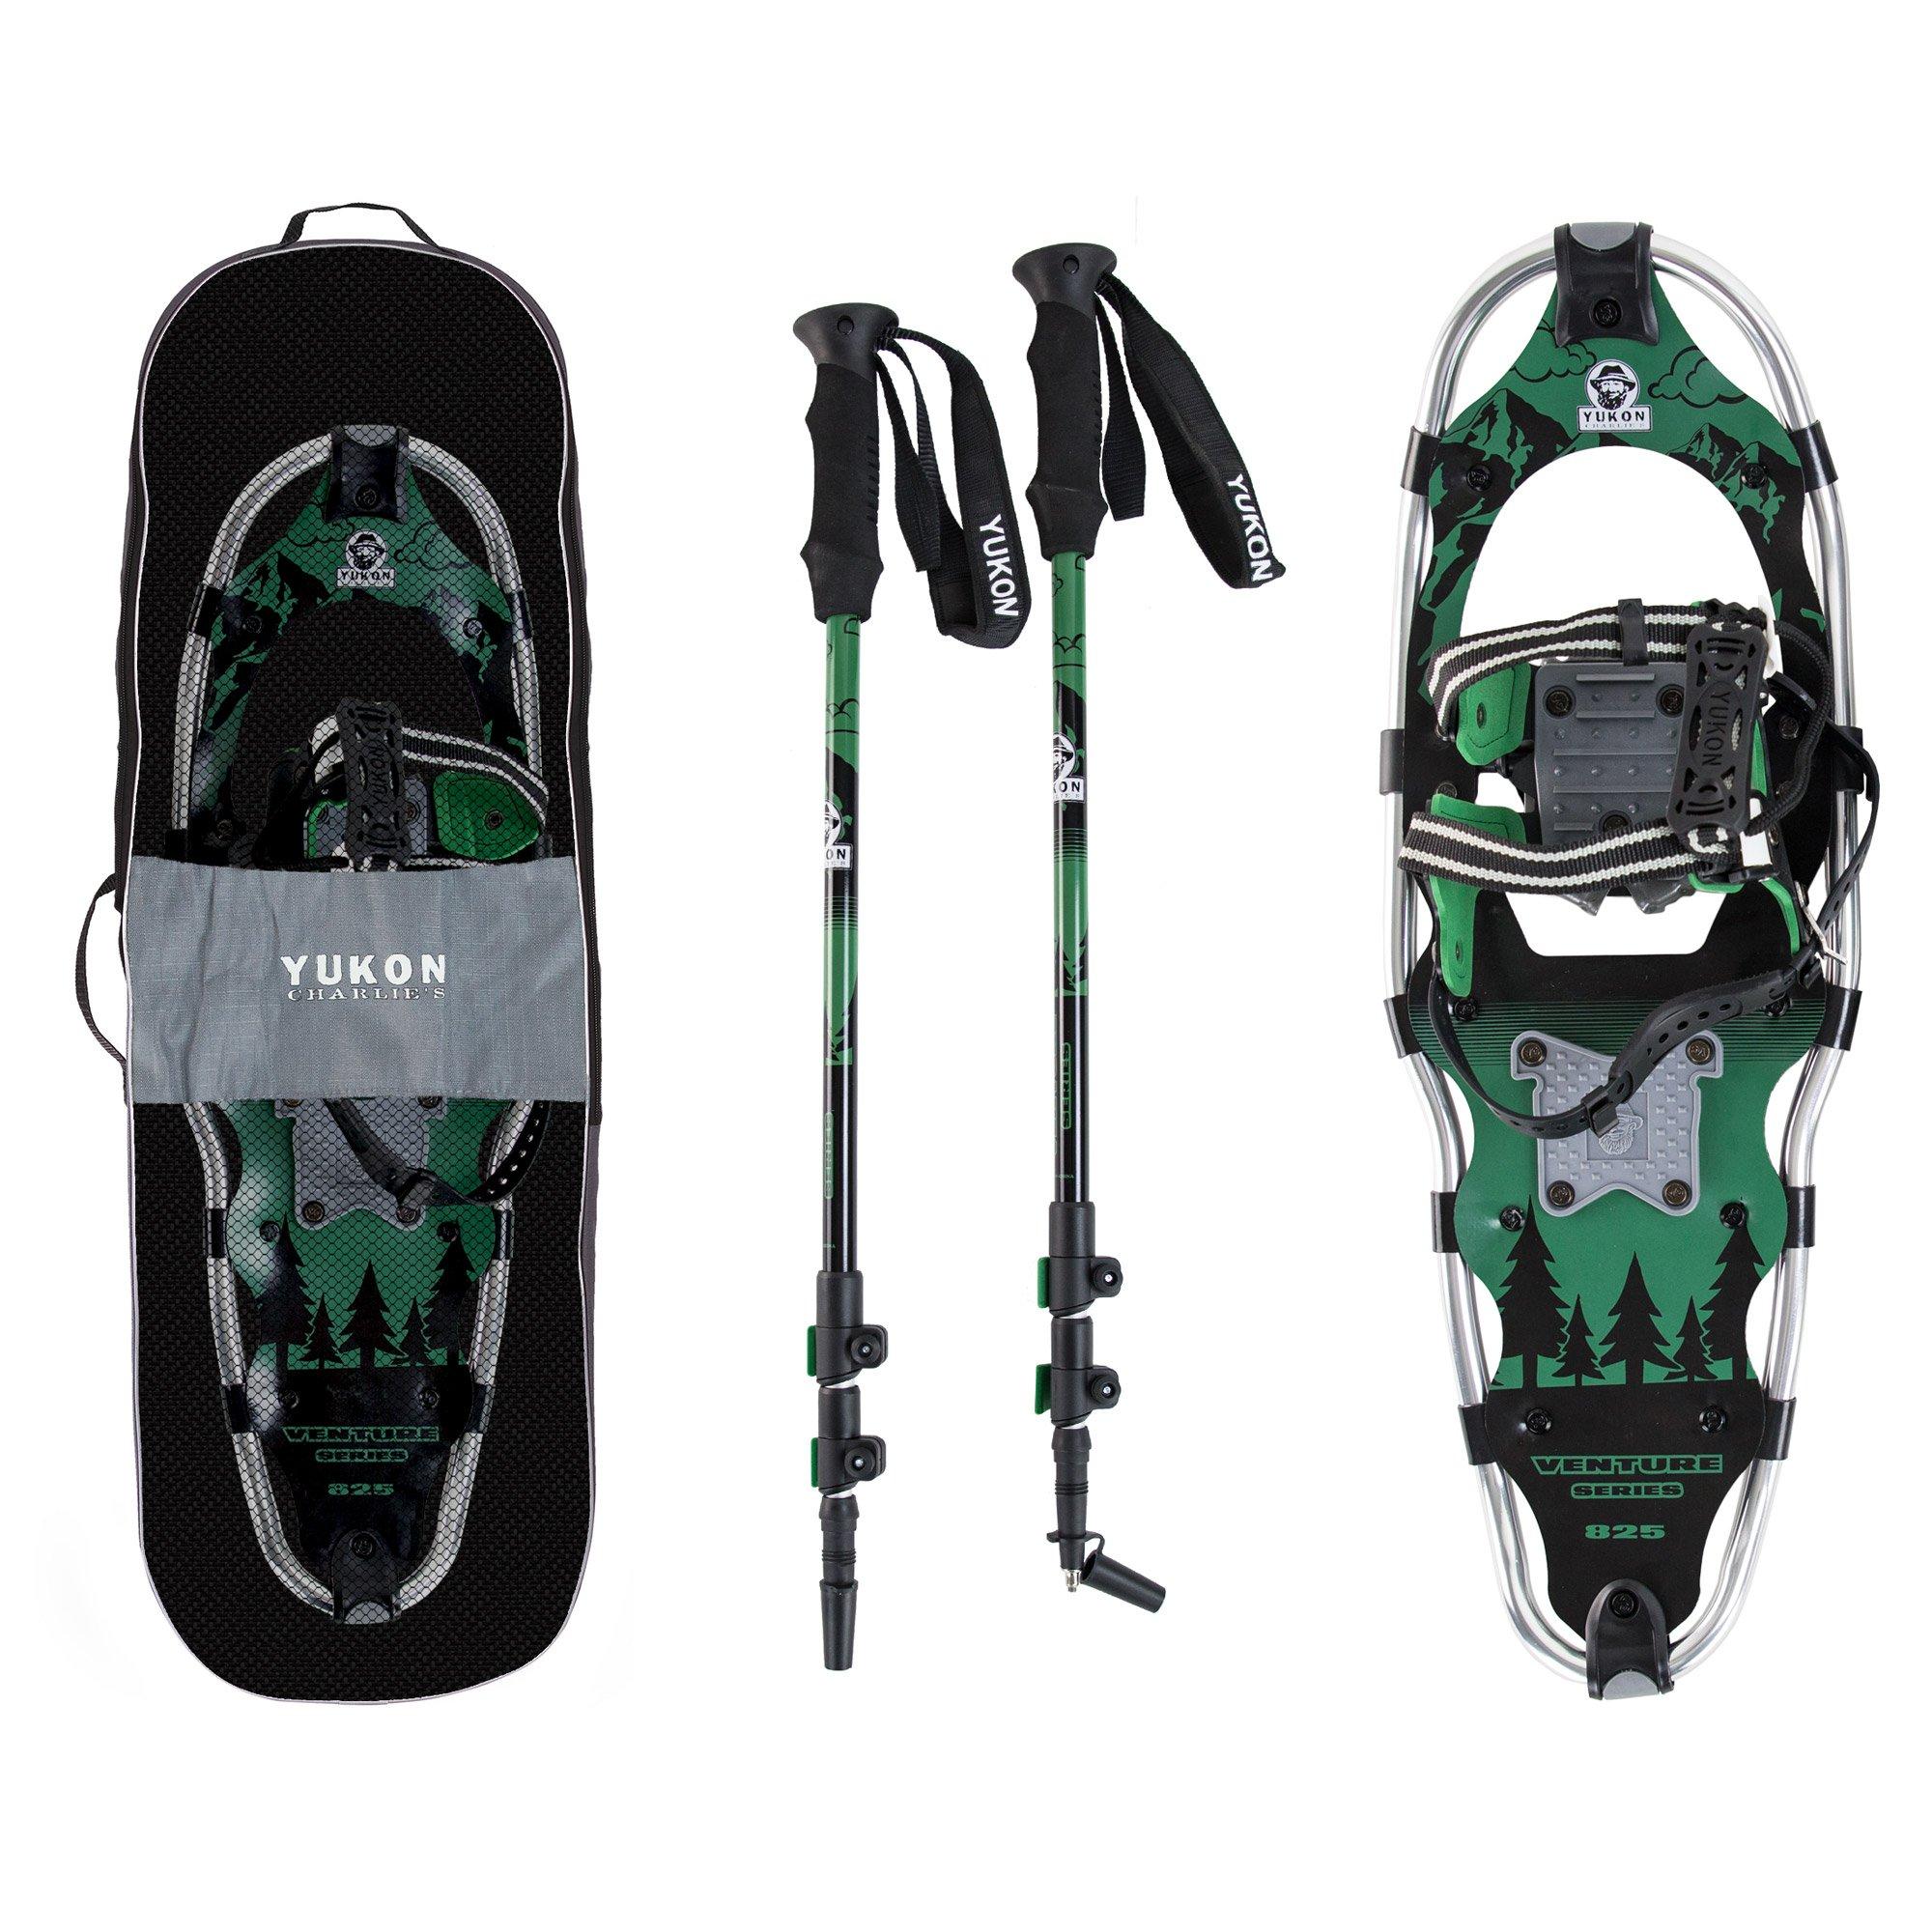 Yukon Charlie's Advanced 9x30 Inch Men's Snowshoe Kit with Aluminum Poles & Bag by Yukon Charlie's